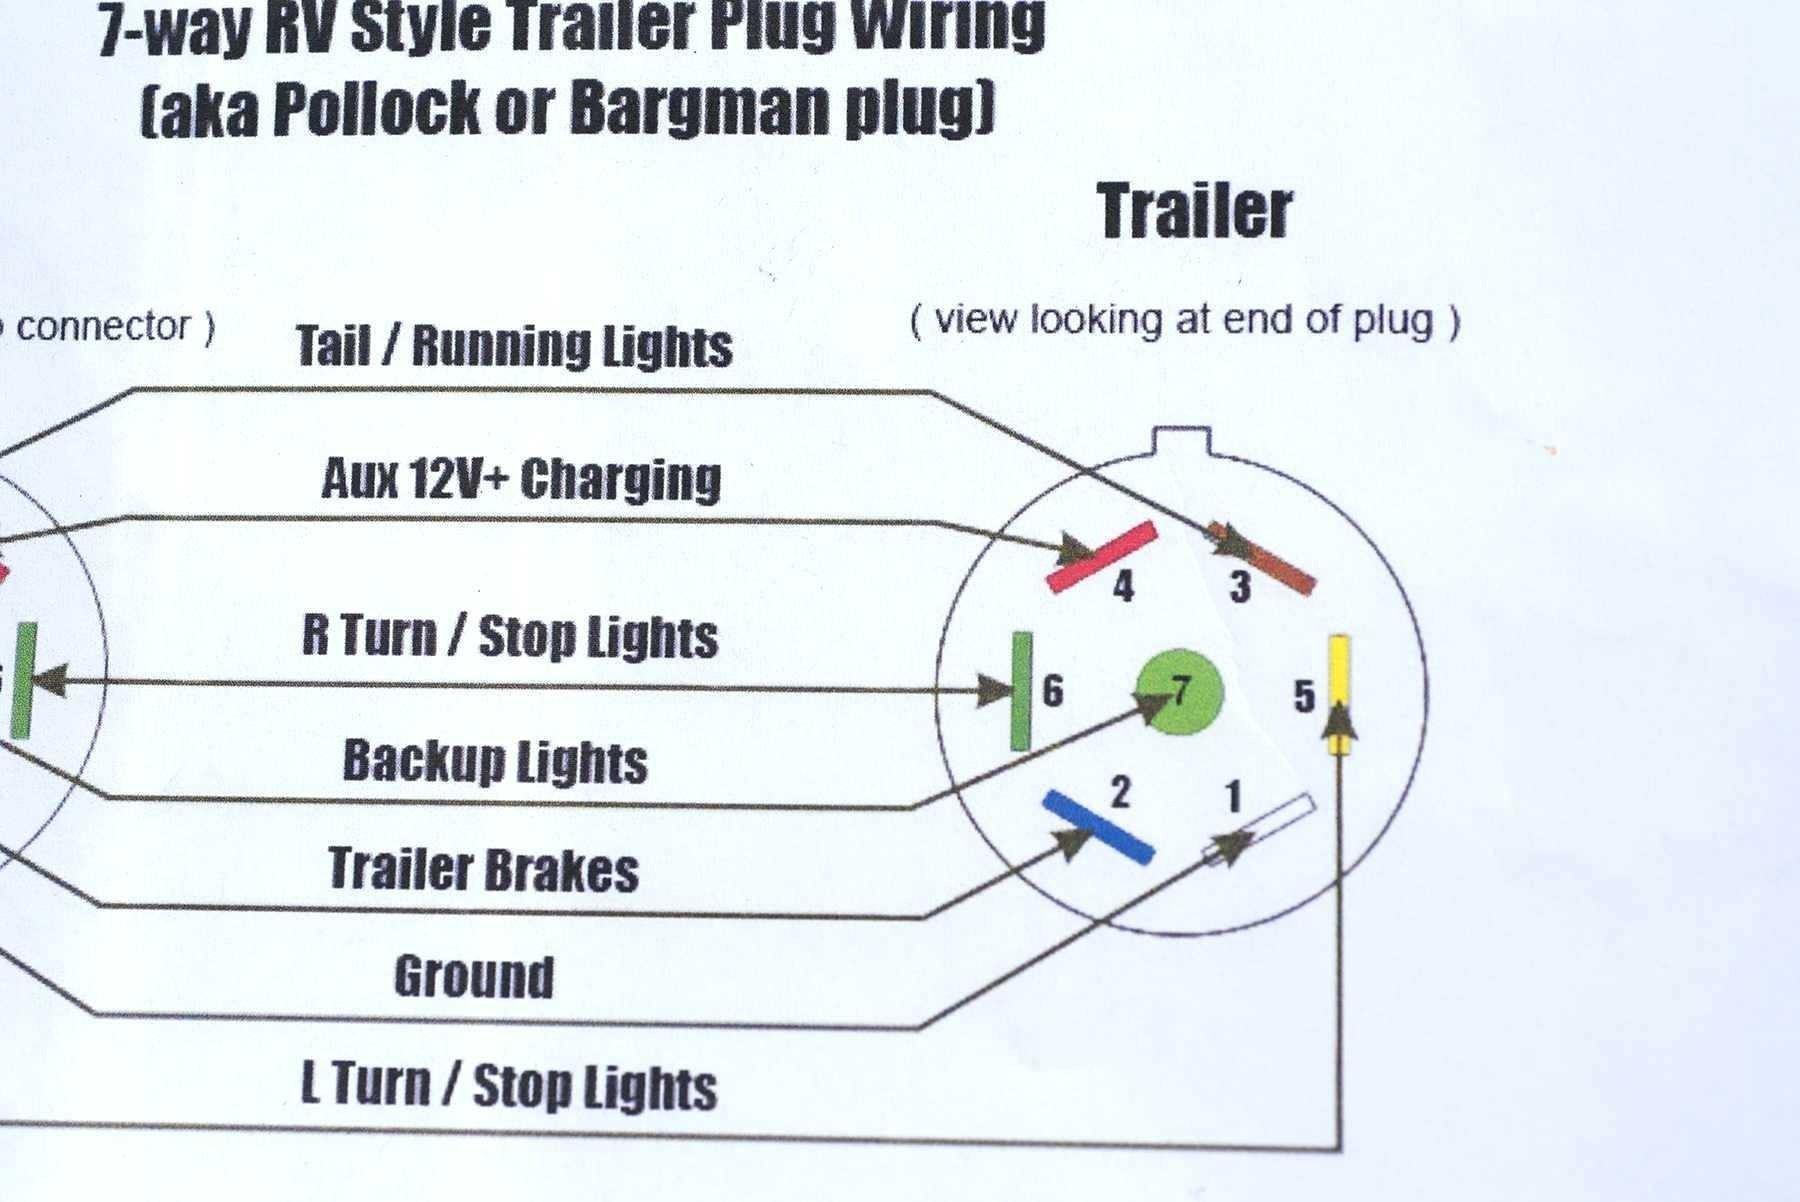 [GJFJ_338]  CW_4780] 7 Pin Round Trailer Plug Wiring Diagram Download Diagram | Kenworth 7 Way Wiring Diagram Pigtail |  | Ynthe Favo Venet Opein Taliz Unre Tivexi Eatte Mohammedshrine Librar Wiring  101